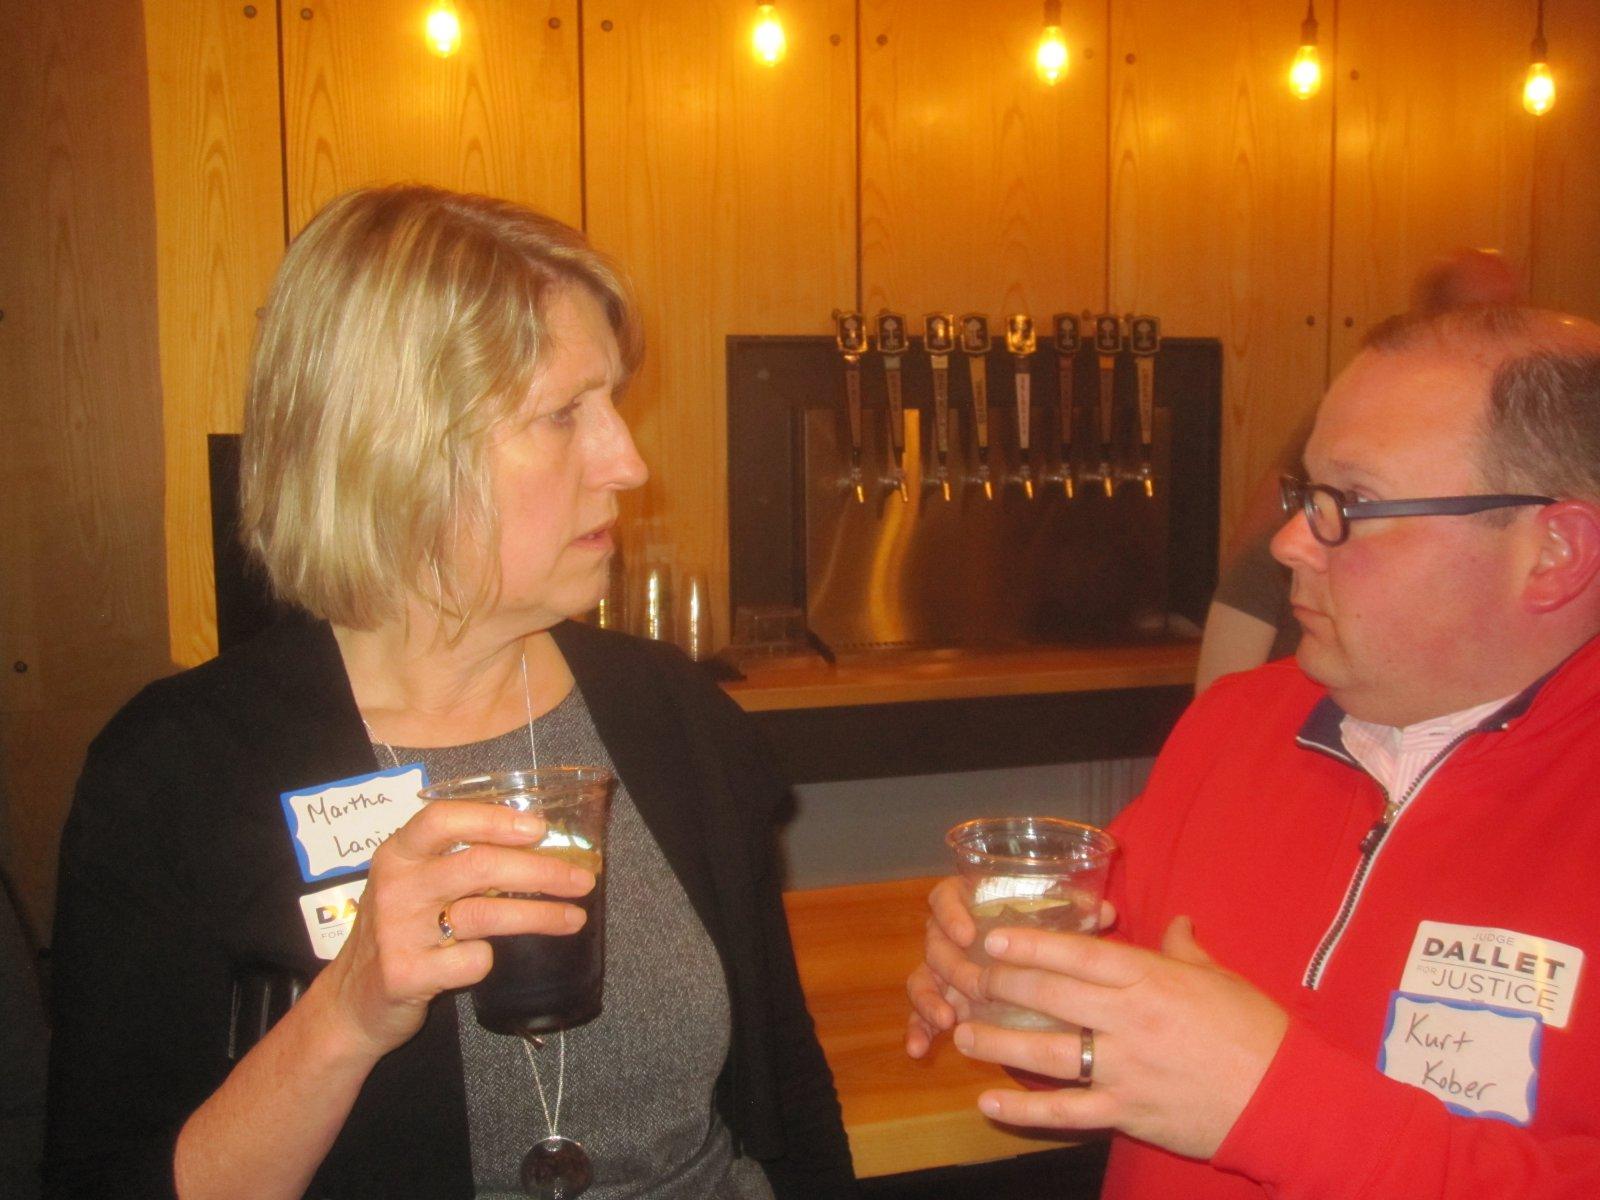 Martha Laning and Kurt Kober